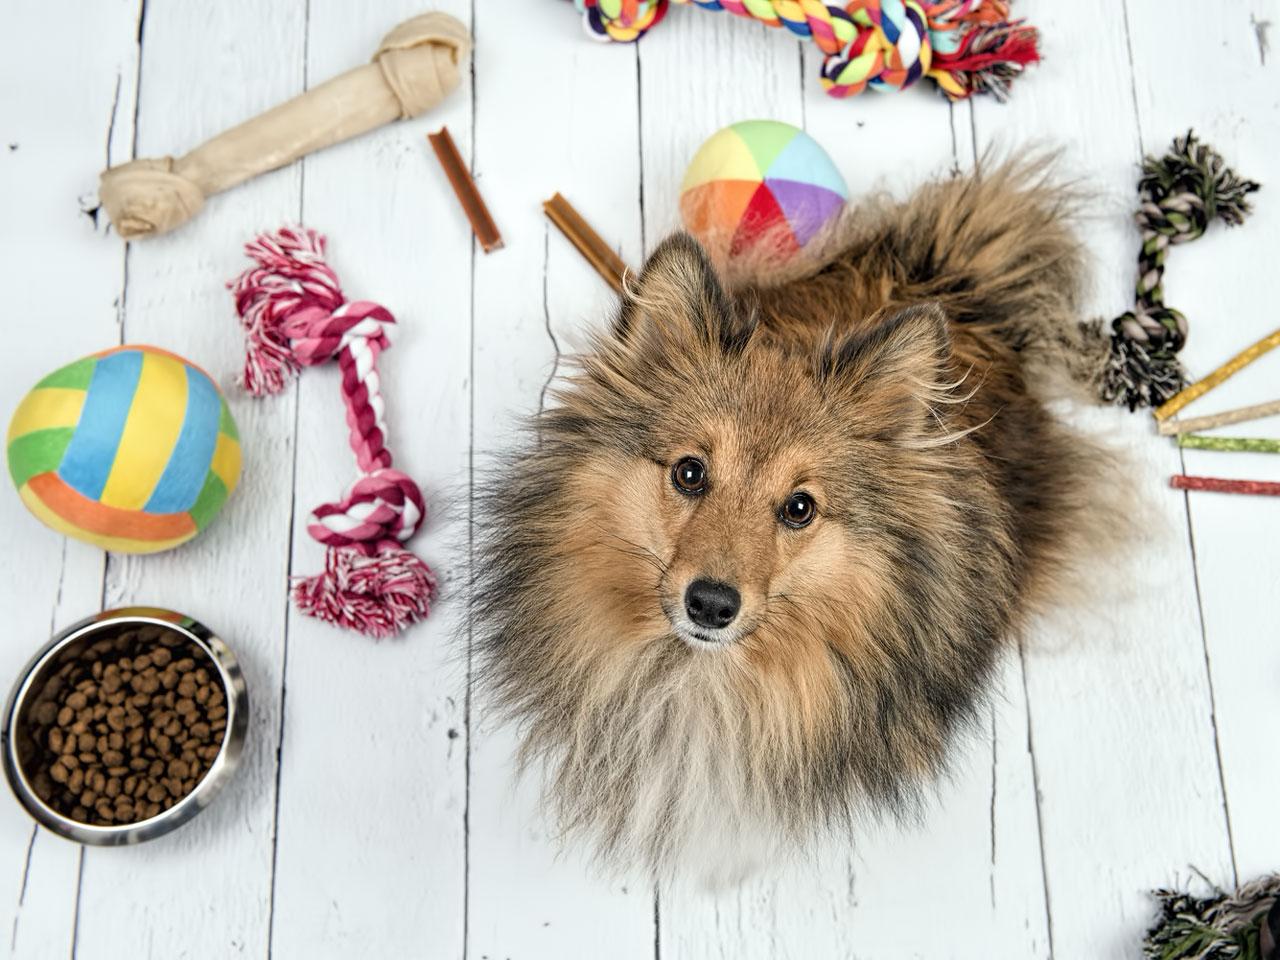 Shetland Sheepdog von Hundespielzeug umgeben